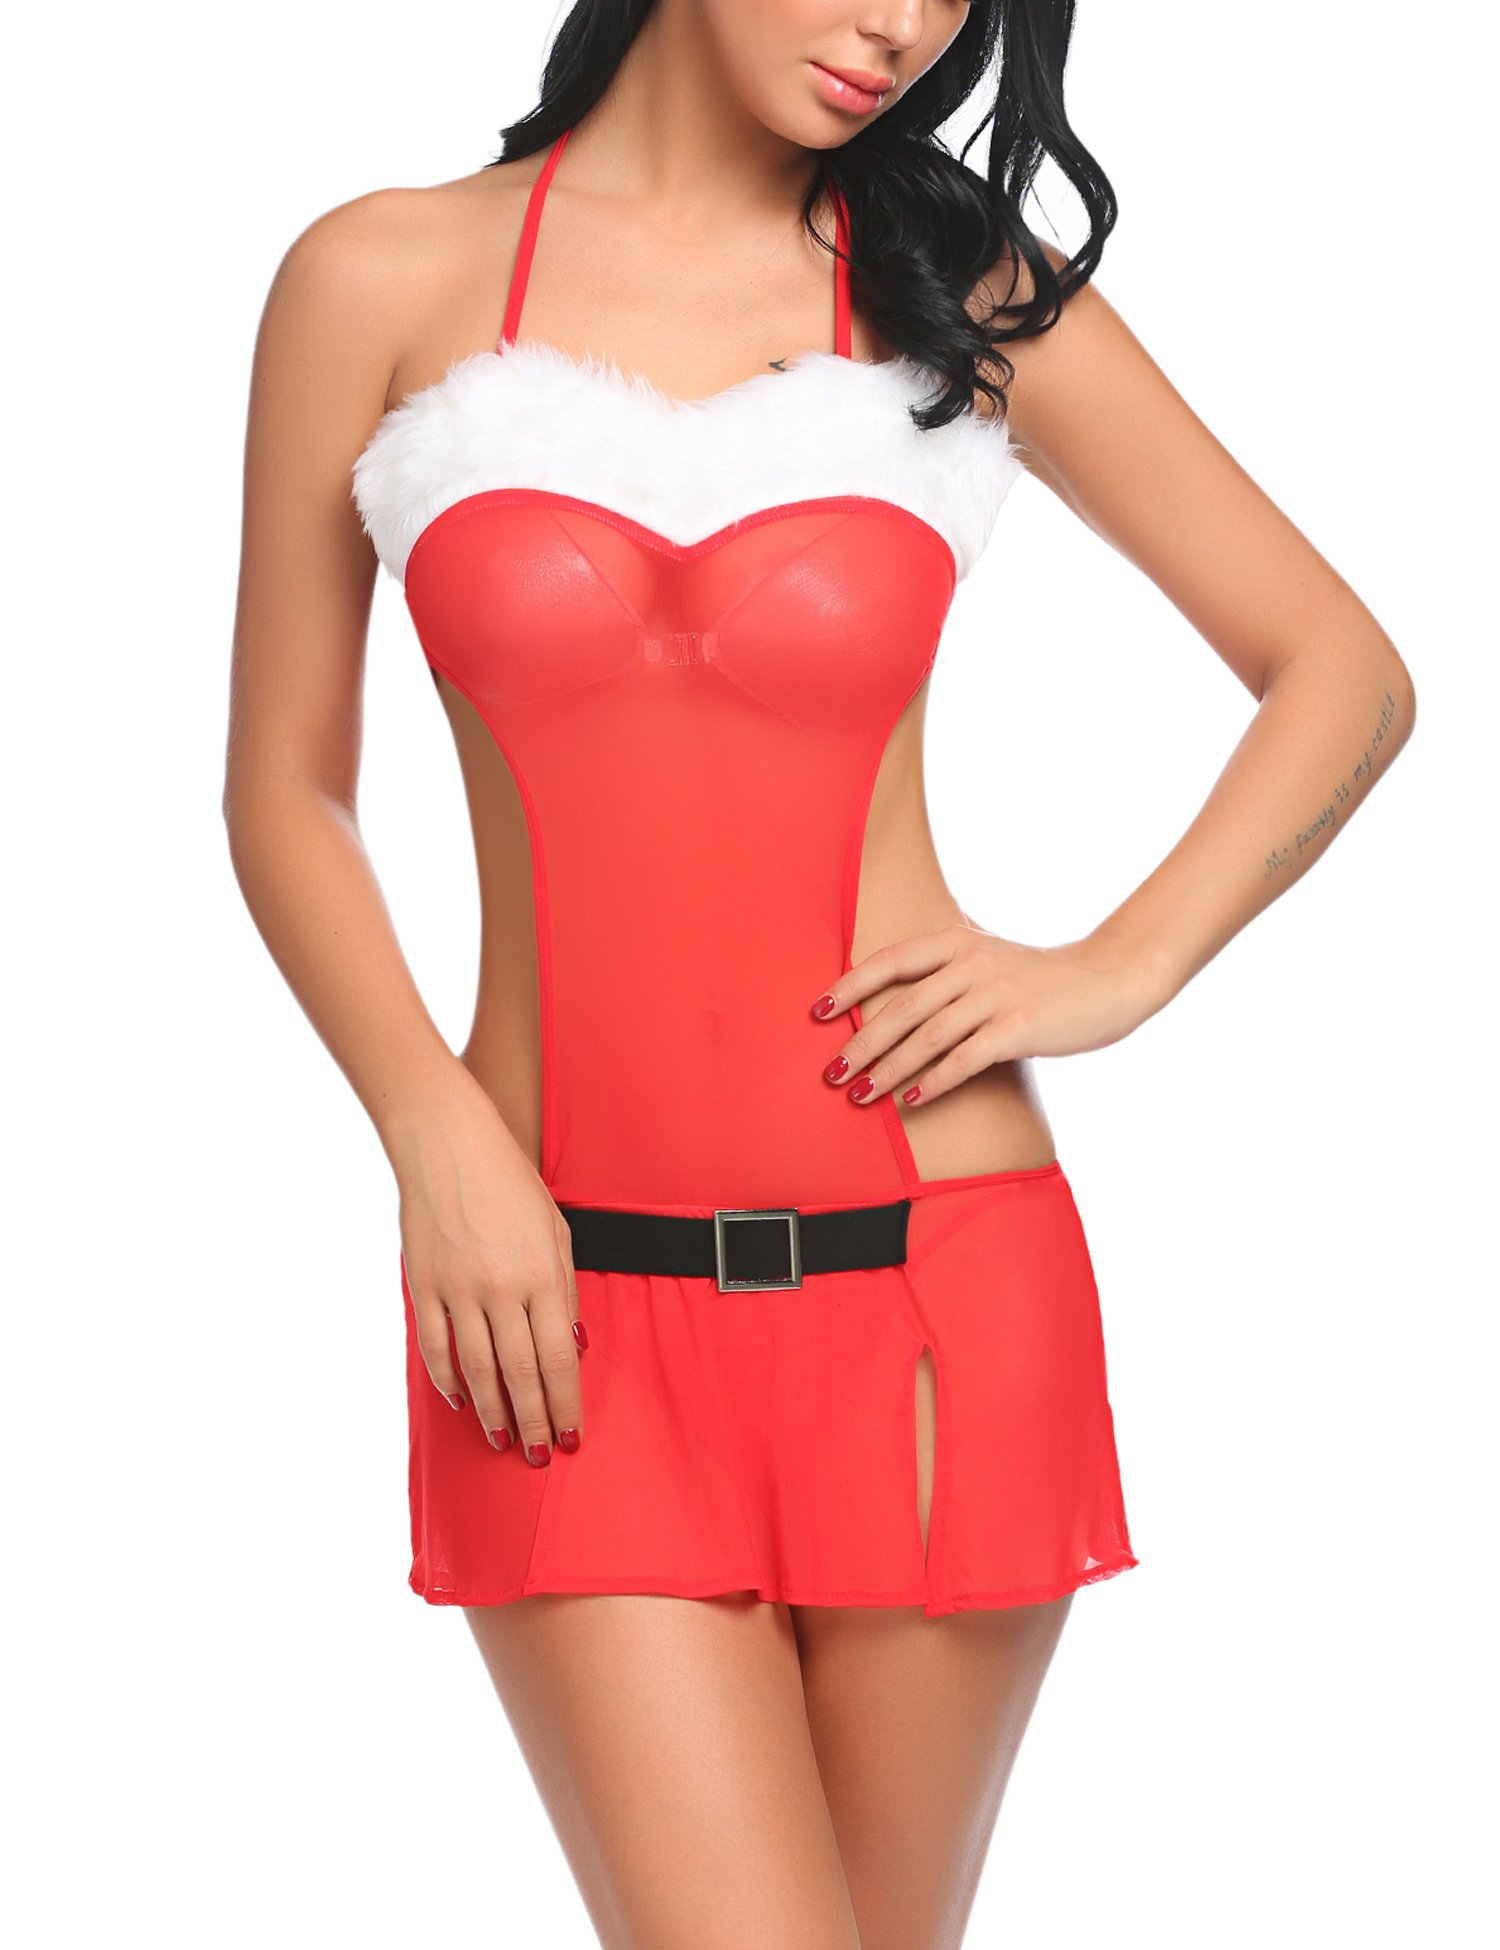 Avidlove Women Sexy Christmas Lingerie Set Red Santa Teddy Mini Dress Red M